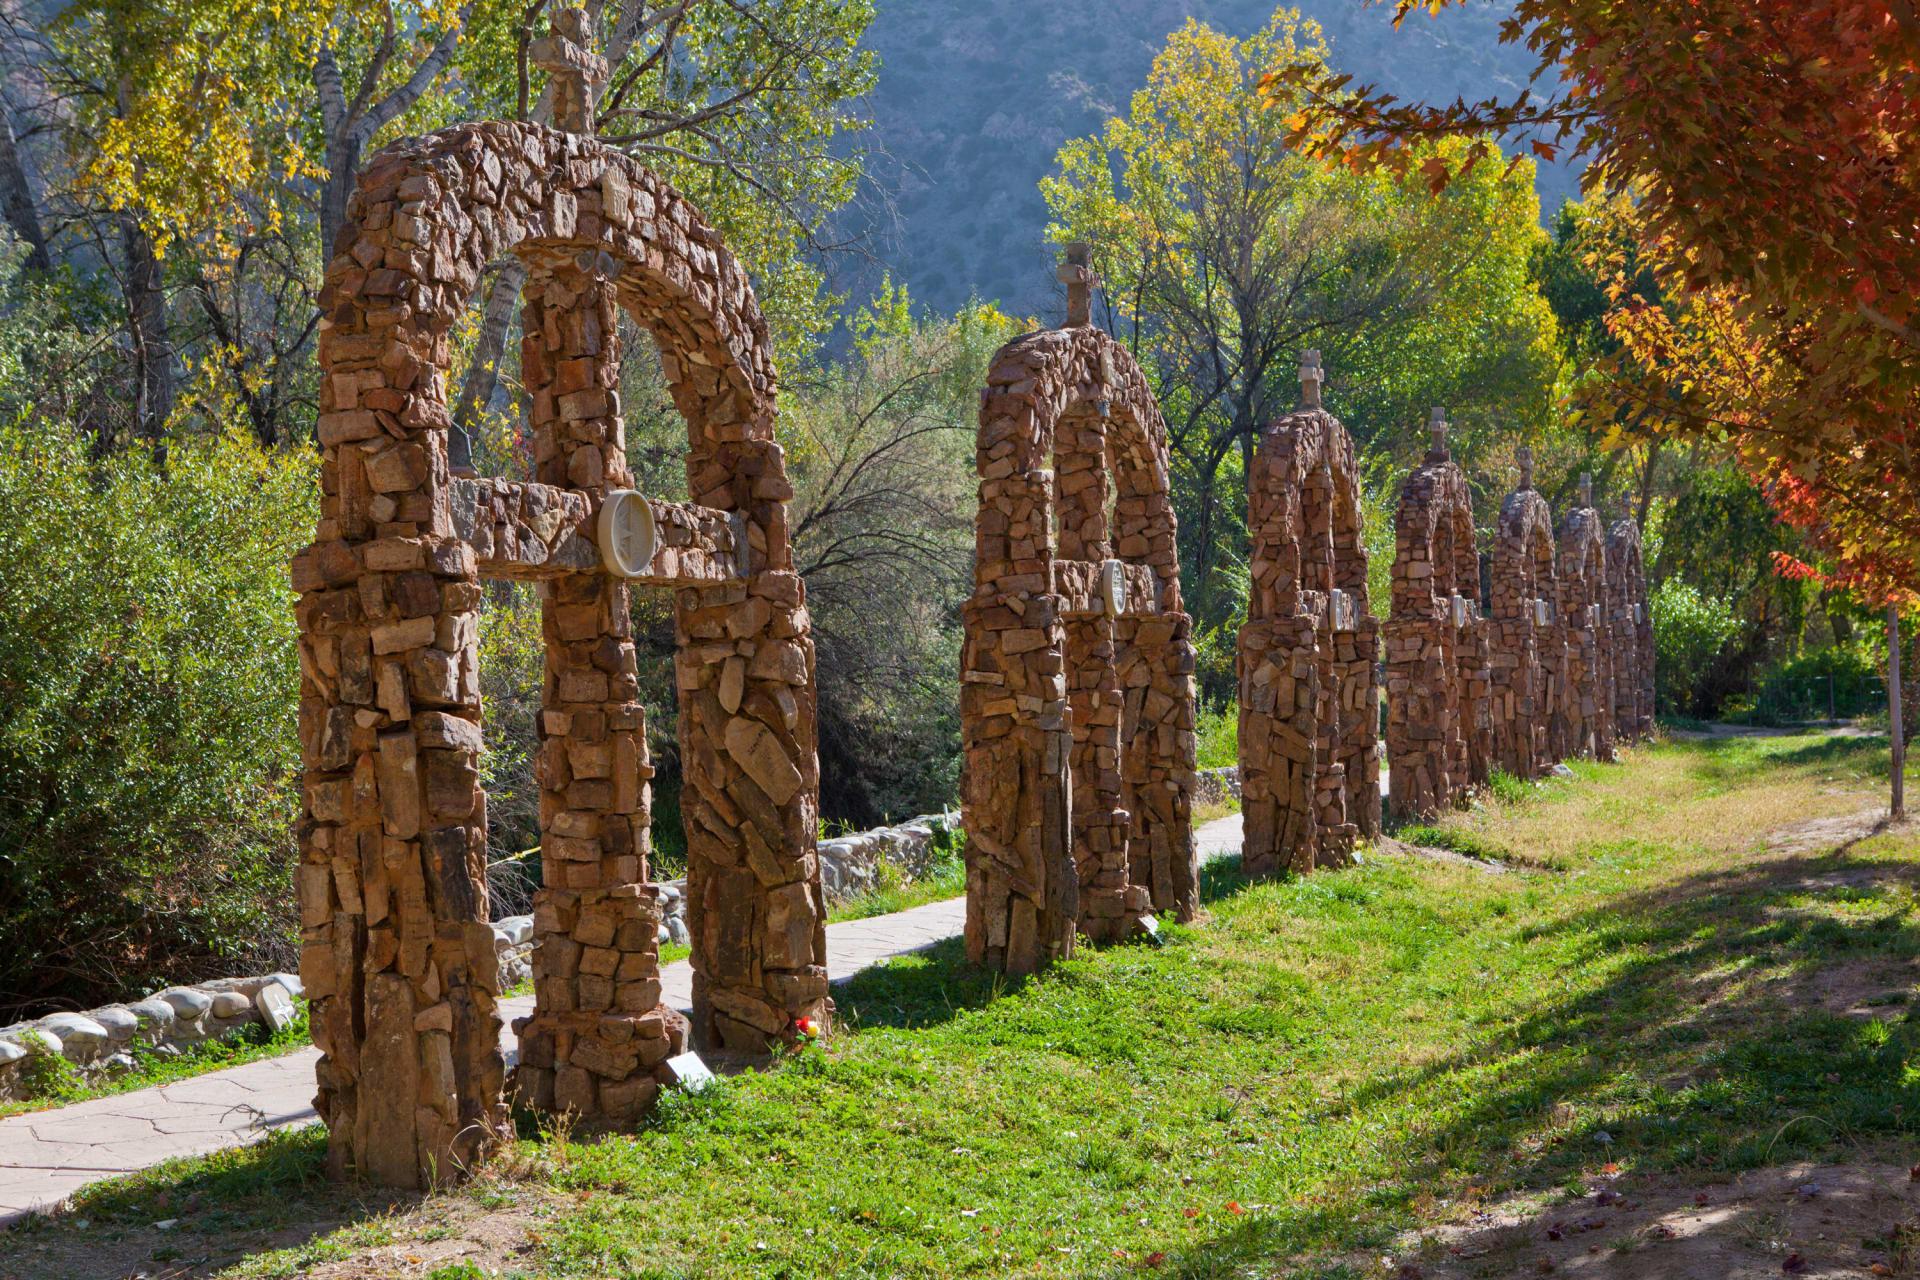 Santuarios & Religious Sites image